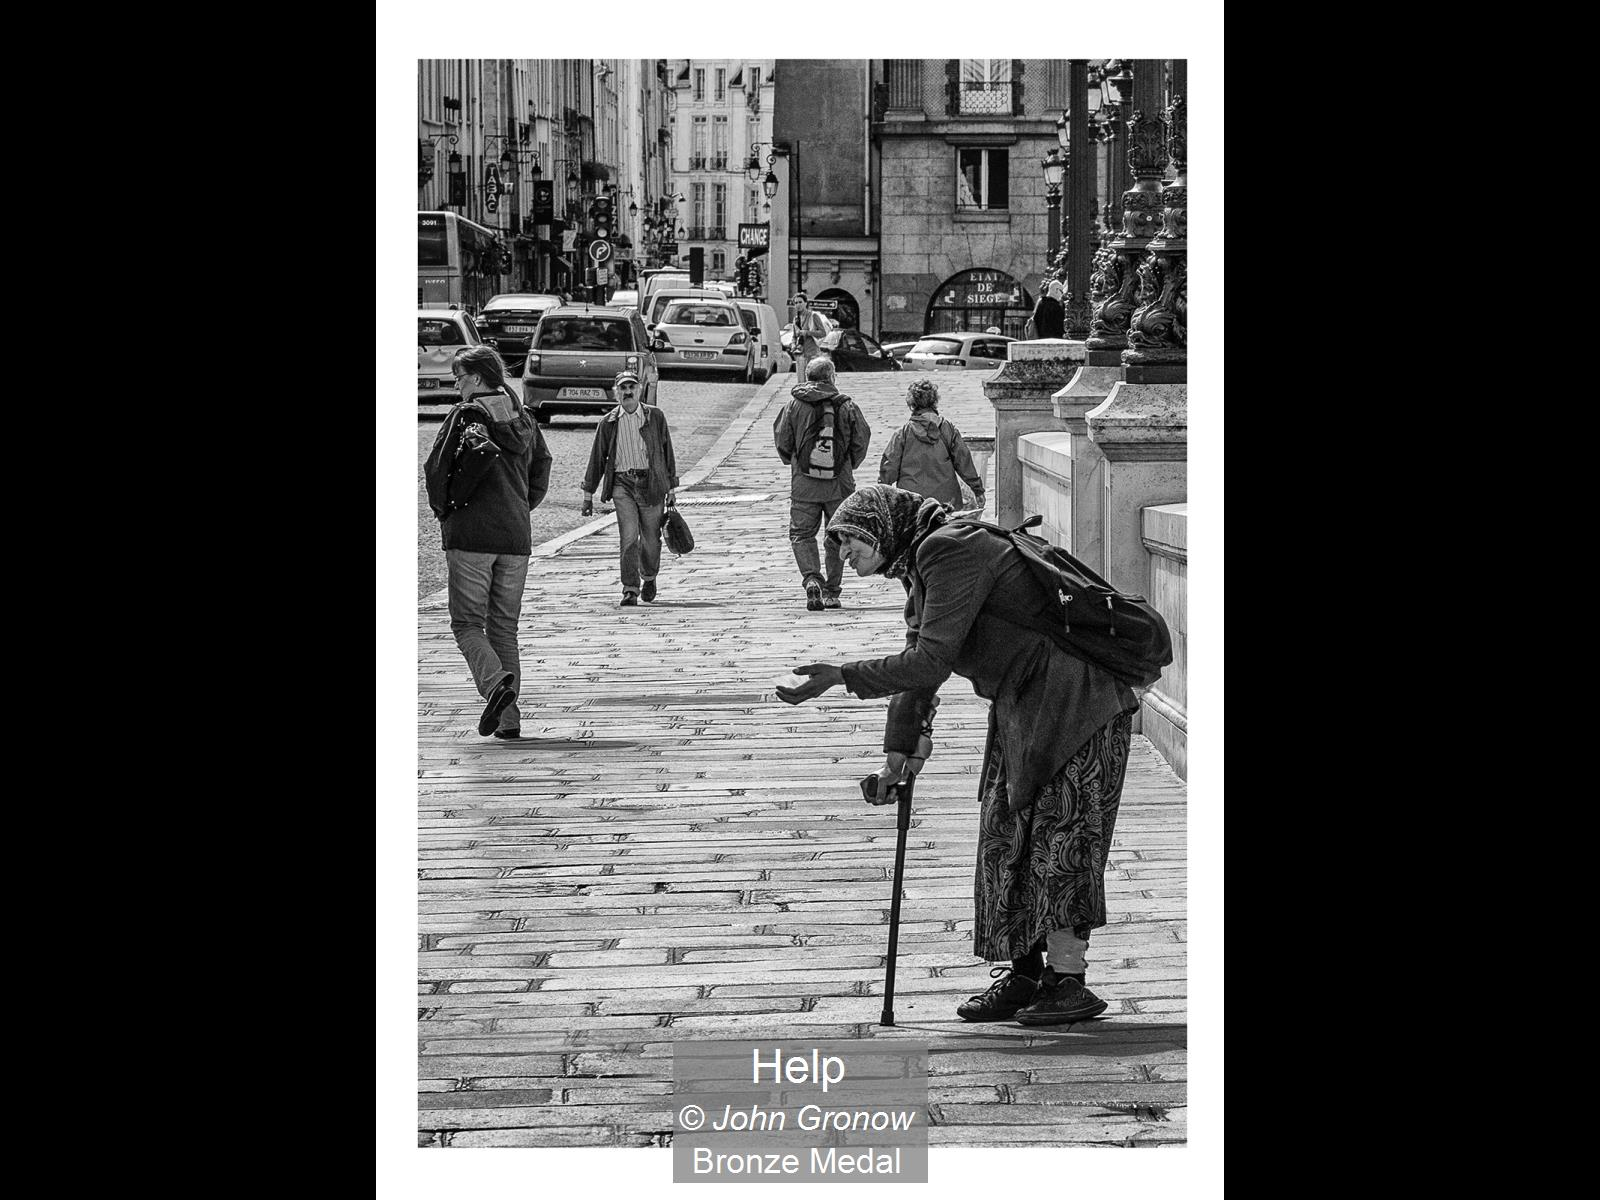 John Gronow_Help_Bronze